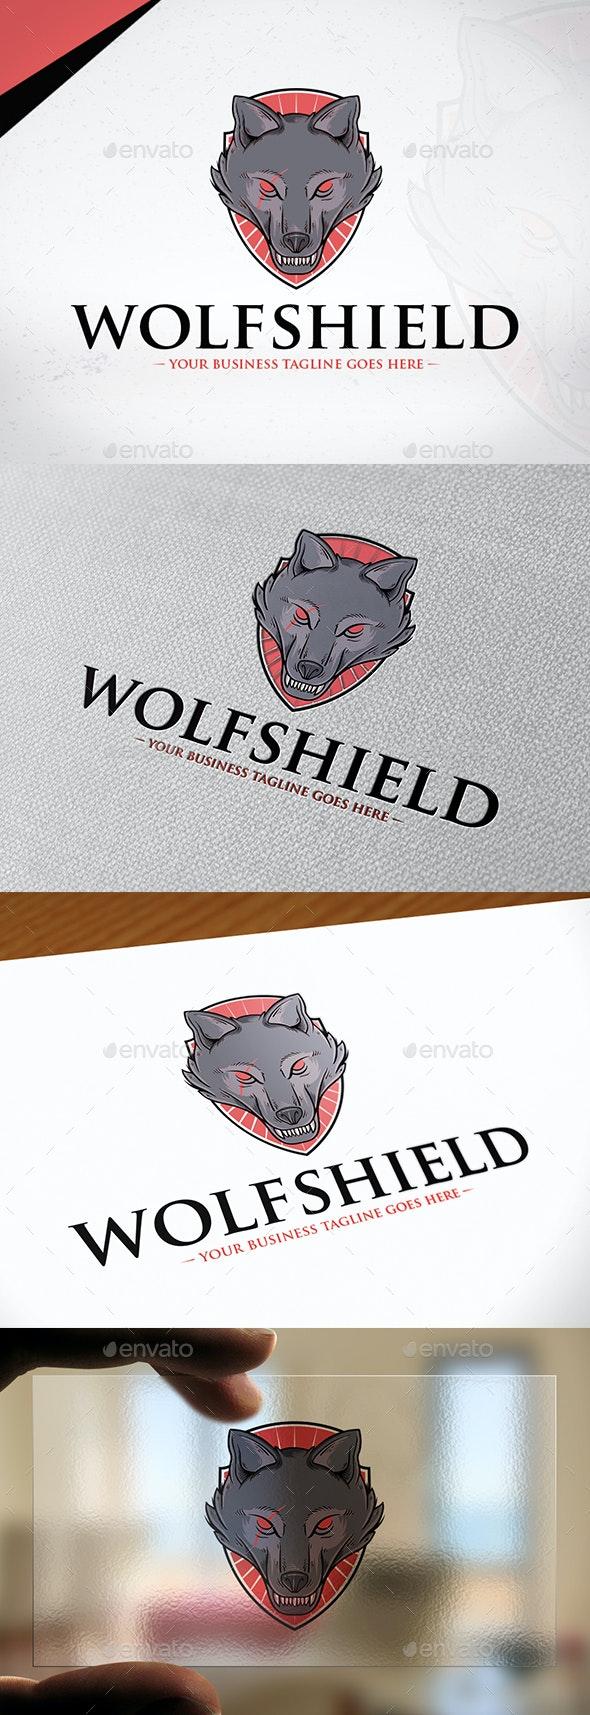 Wolf Shield Logo Template - Animals Logo Templates